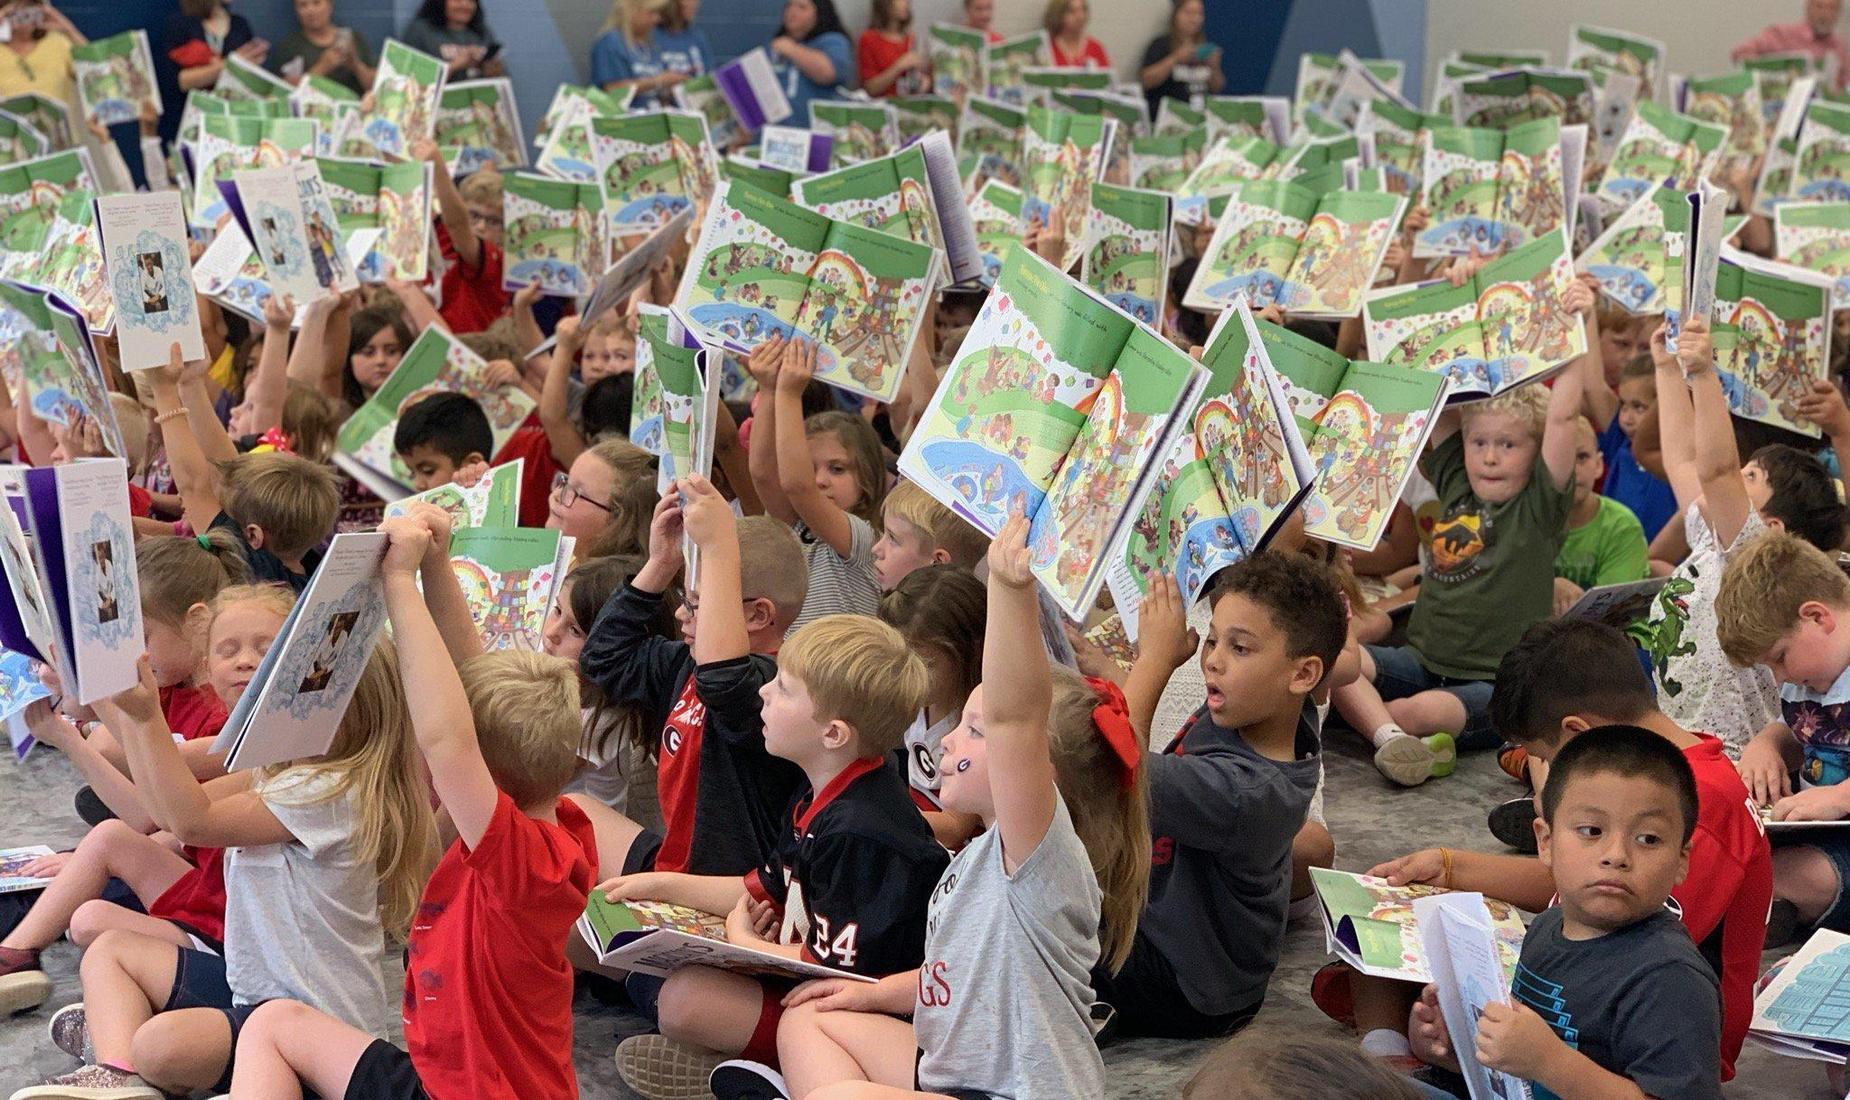 Students sitting holding up books